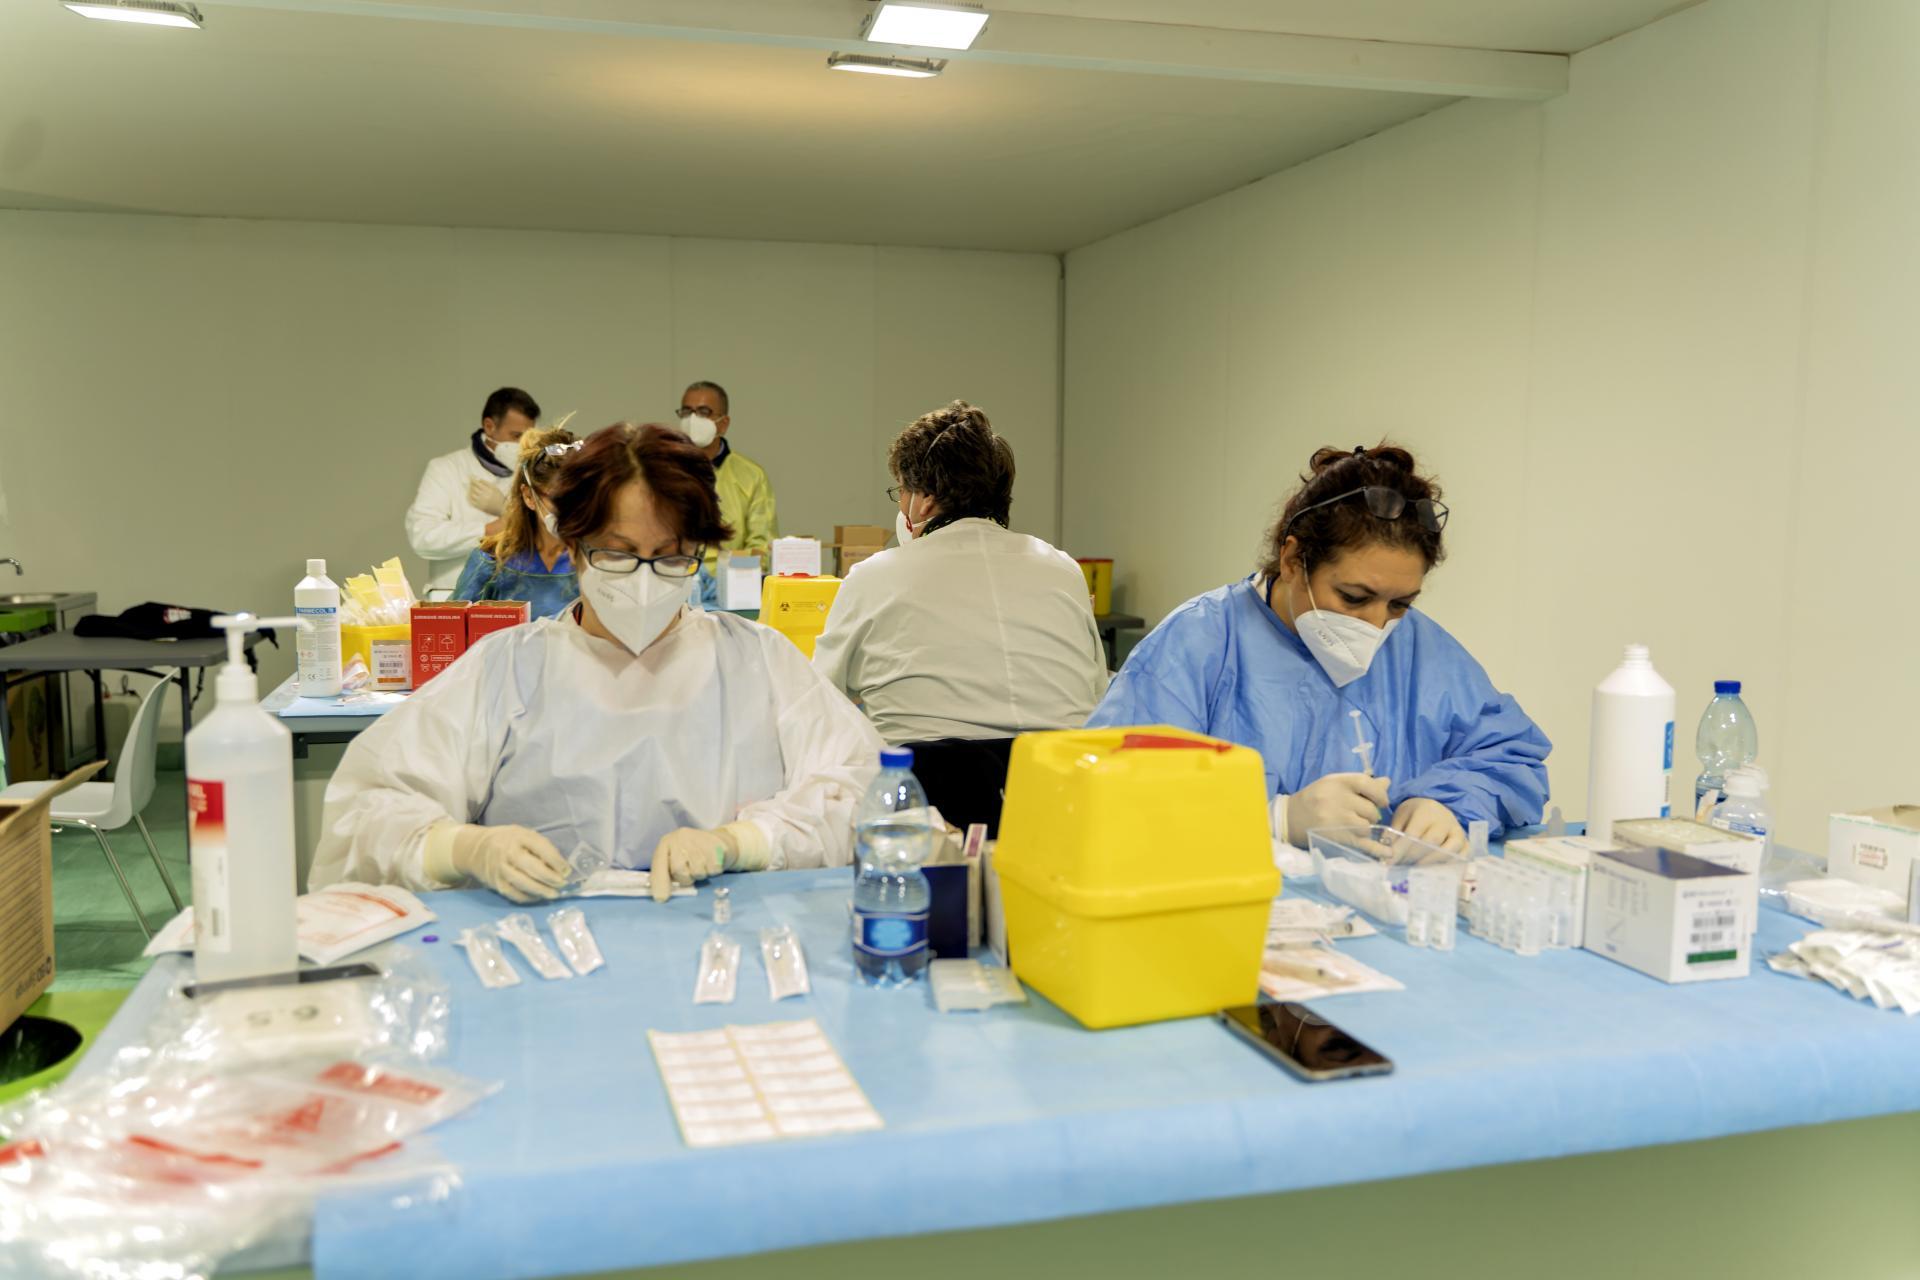 Ситуацията с коронавирус в България... - Türkiye'nin haber kaynağı